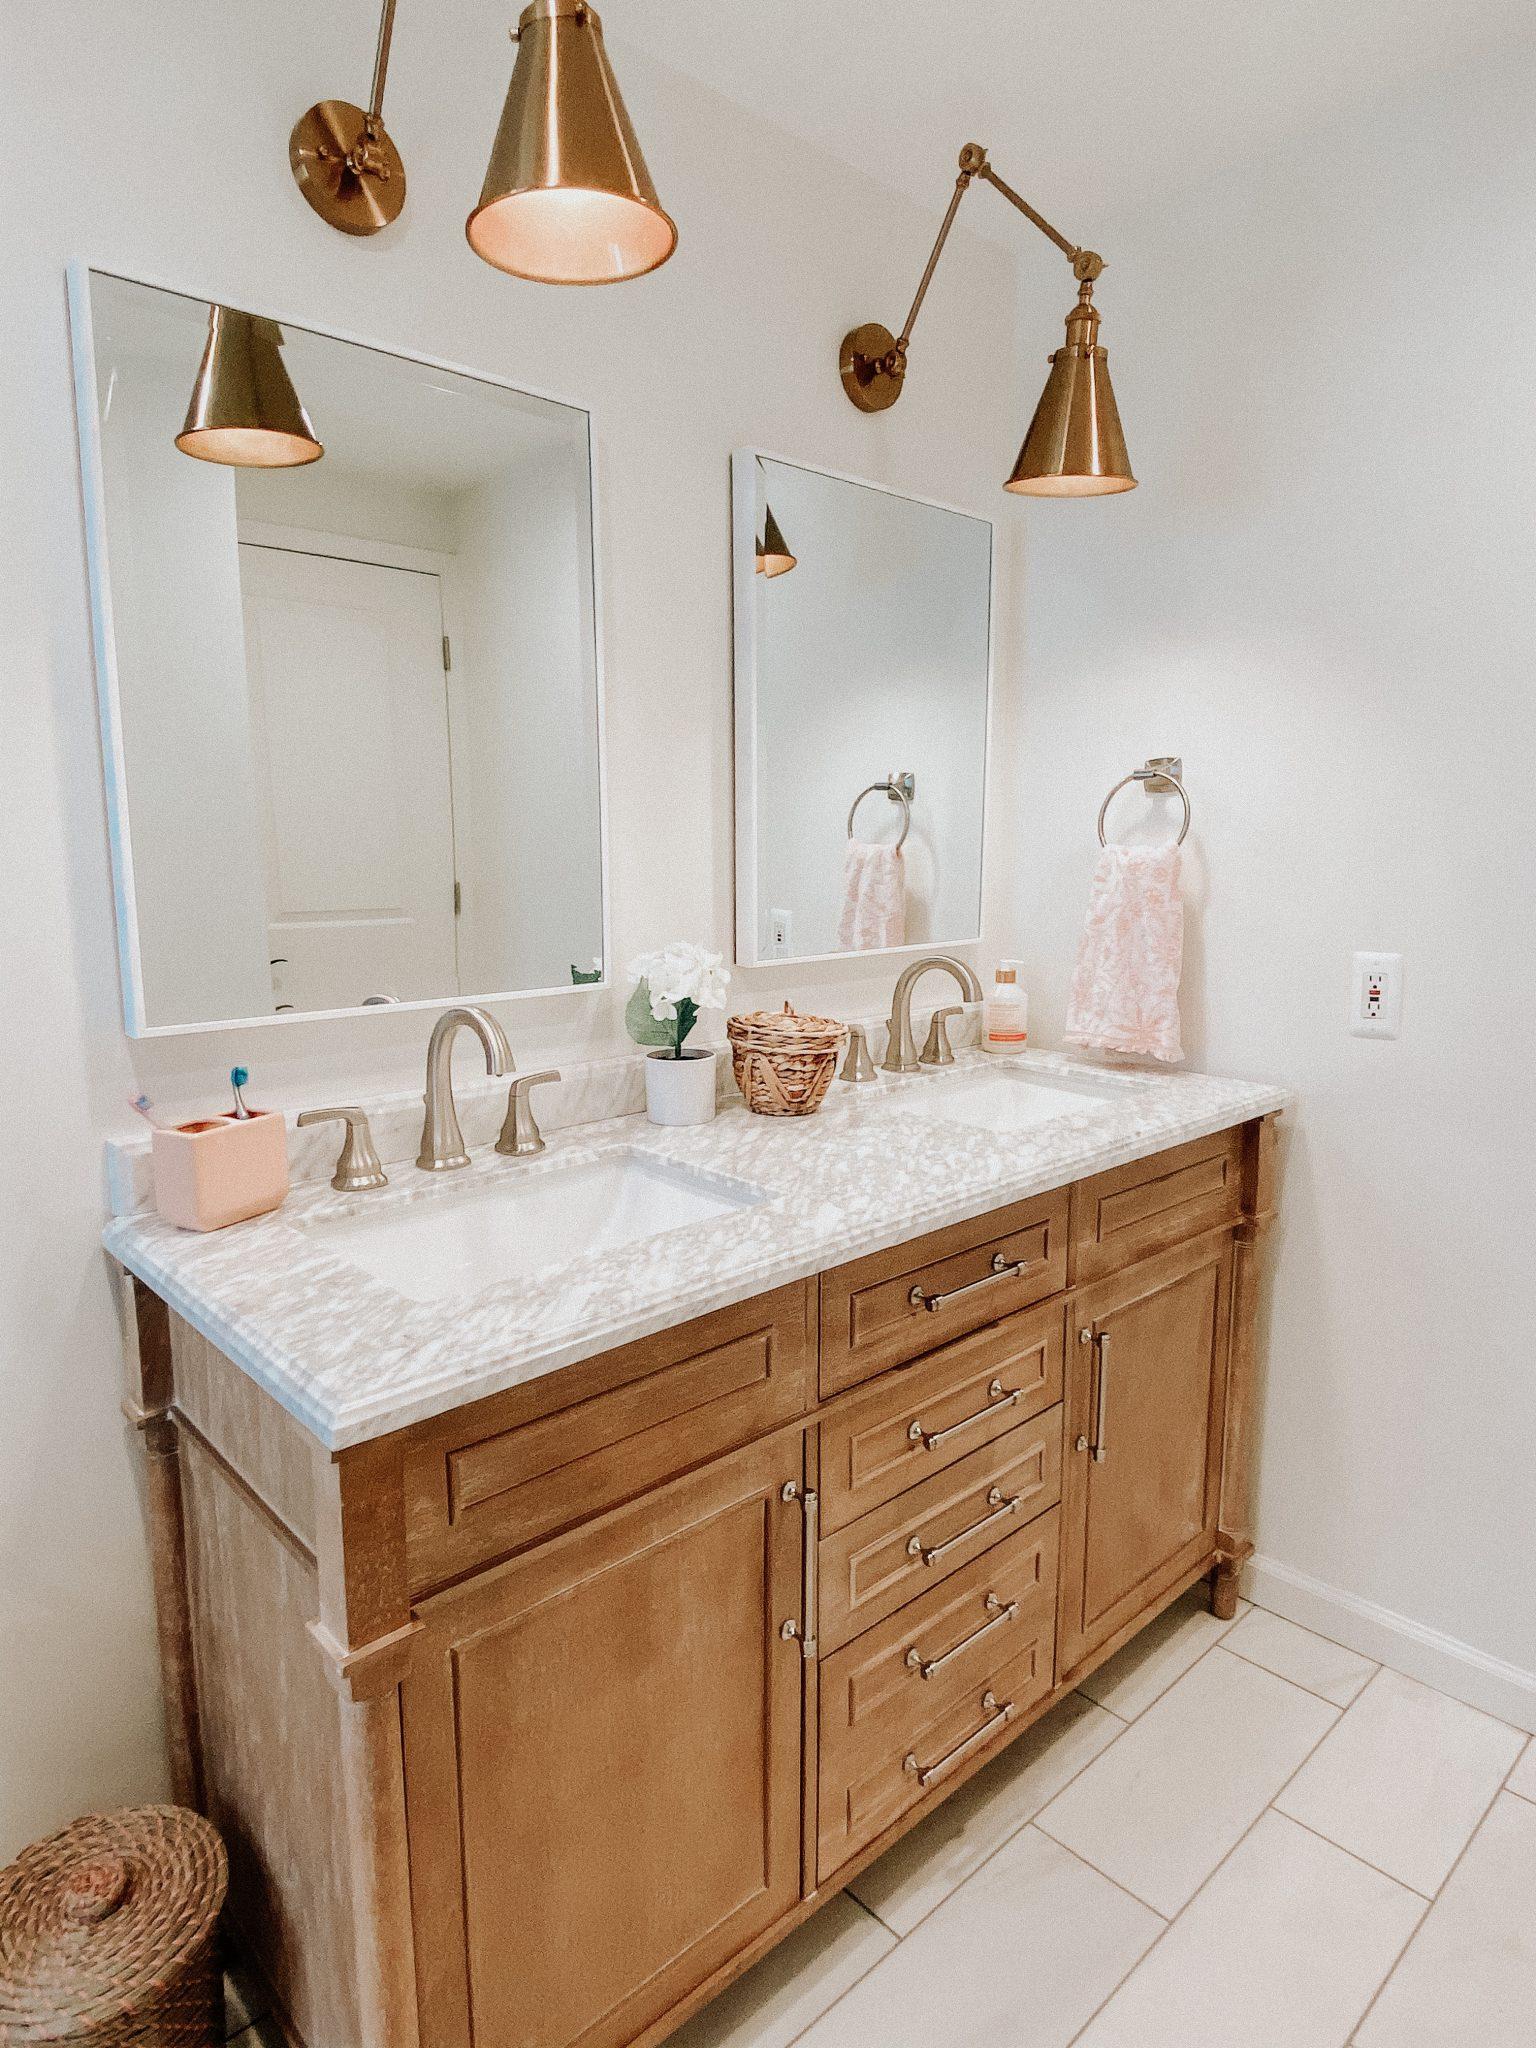 April favorites | Daily Splendor Life and Style Blog | Bathroom Vanity #goldsconce #woodvanity #coastalbathroom